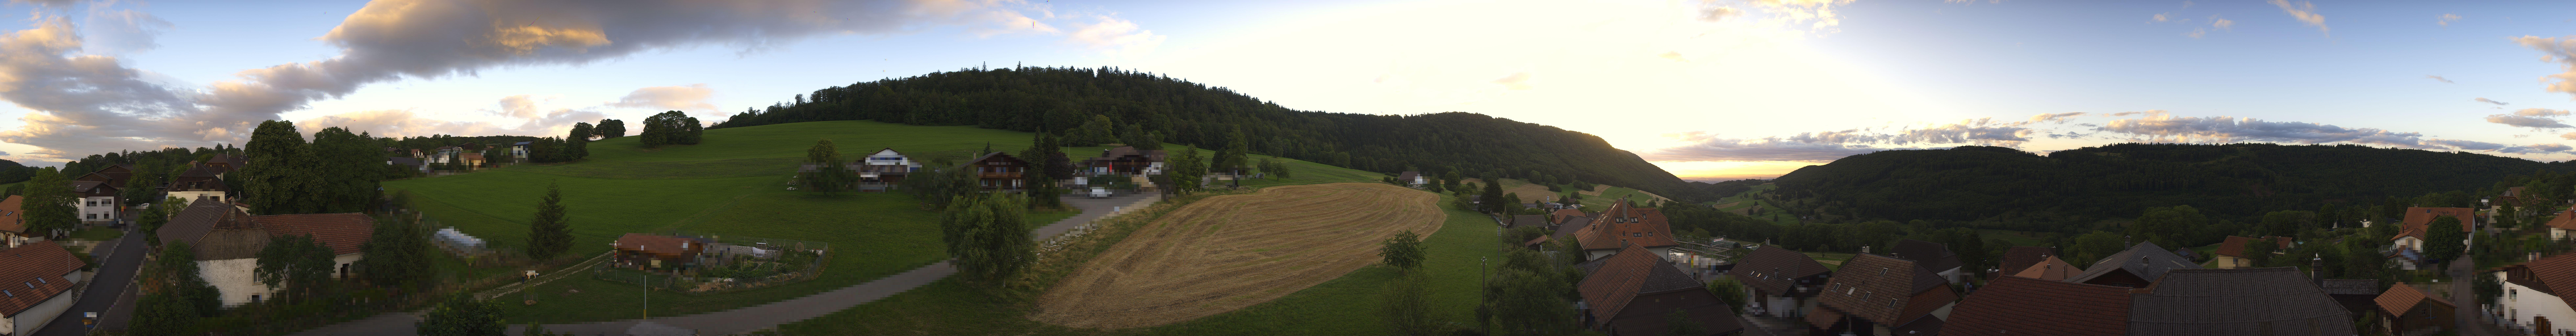 Sauge: Plagne - Bern